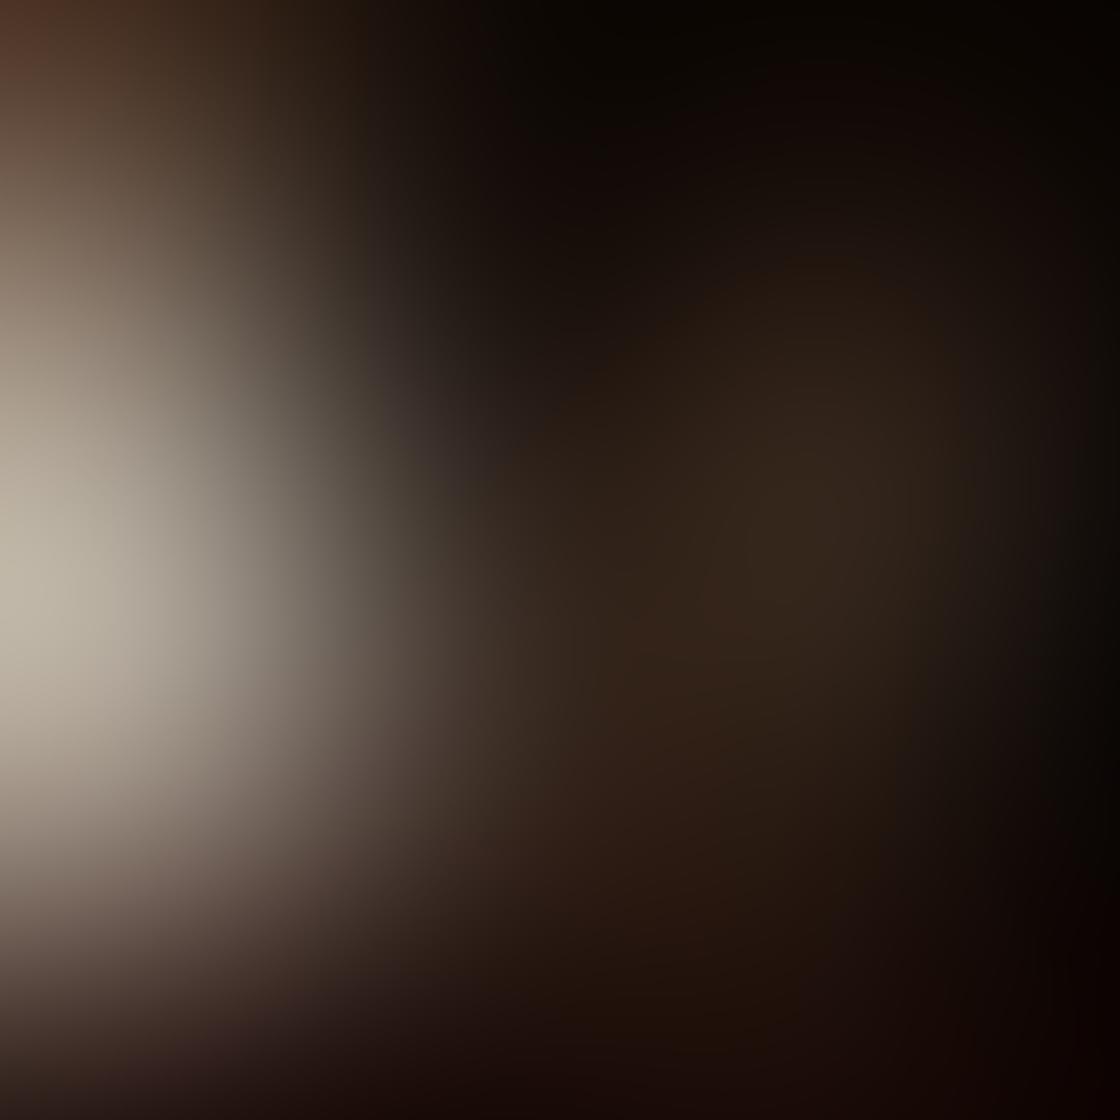 iPhone Angle Photo 13